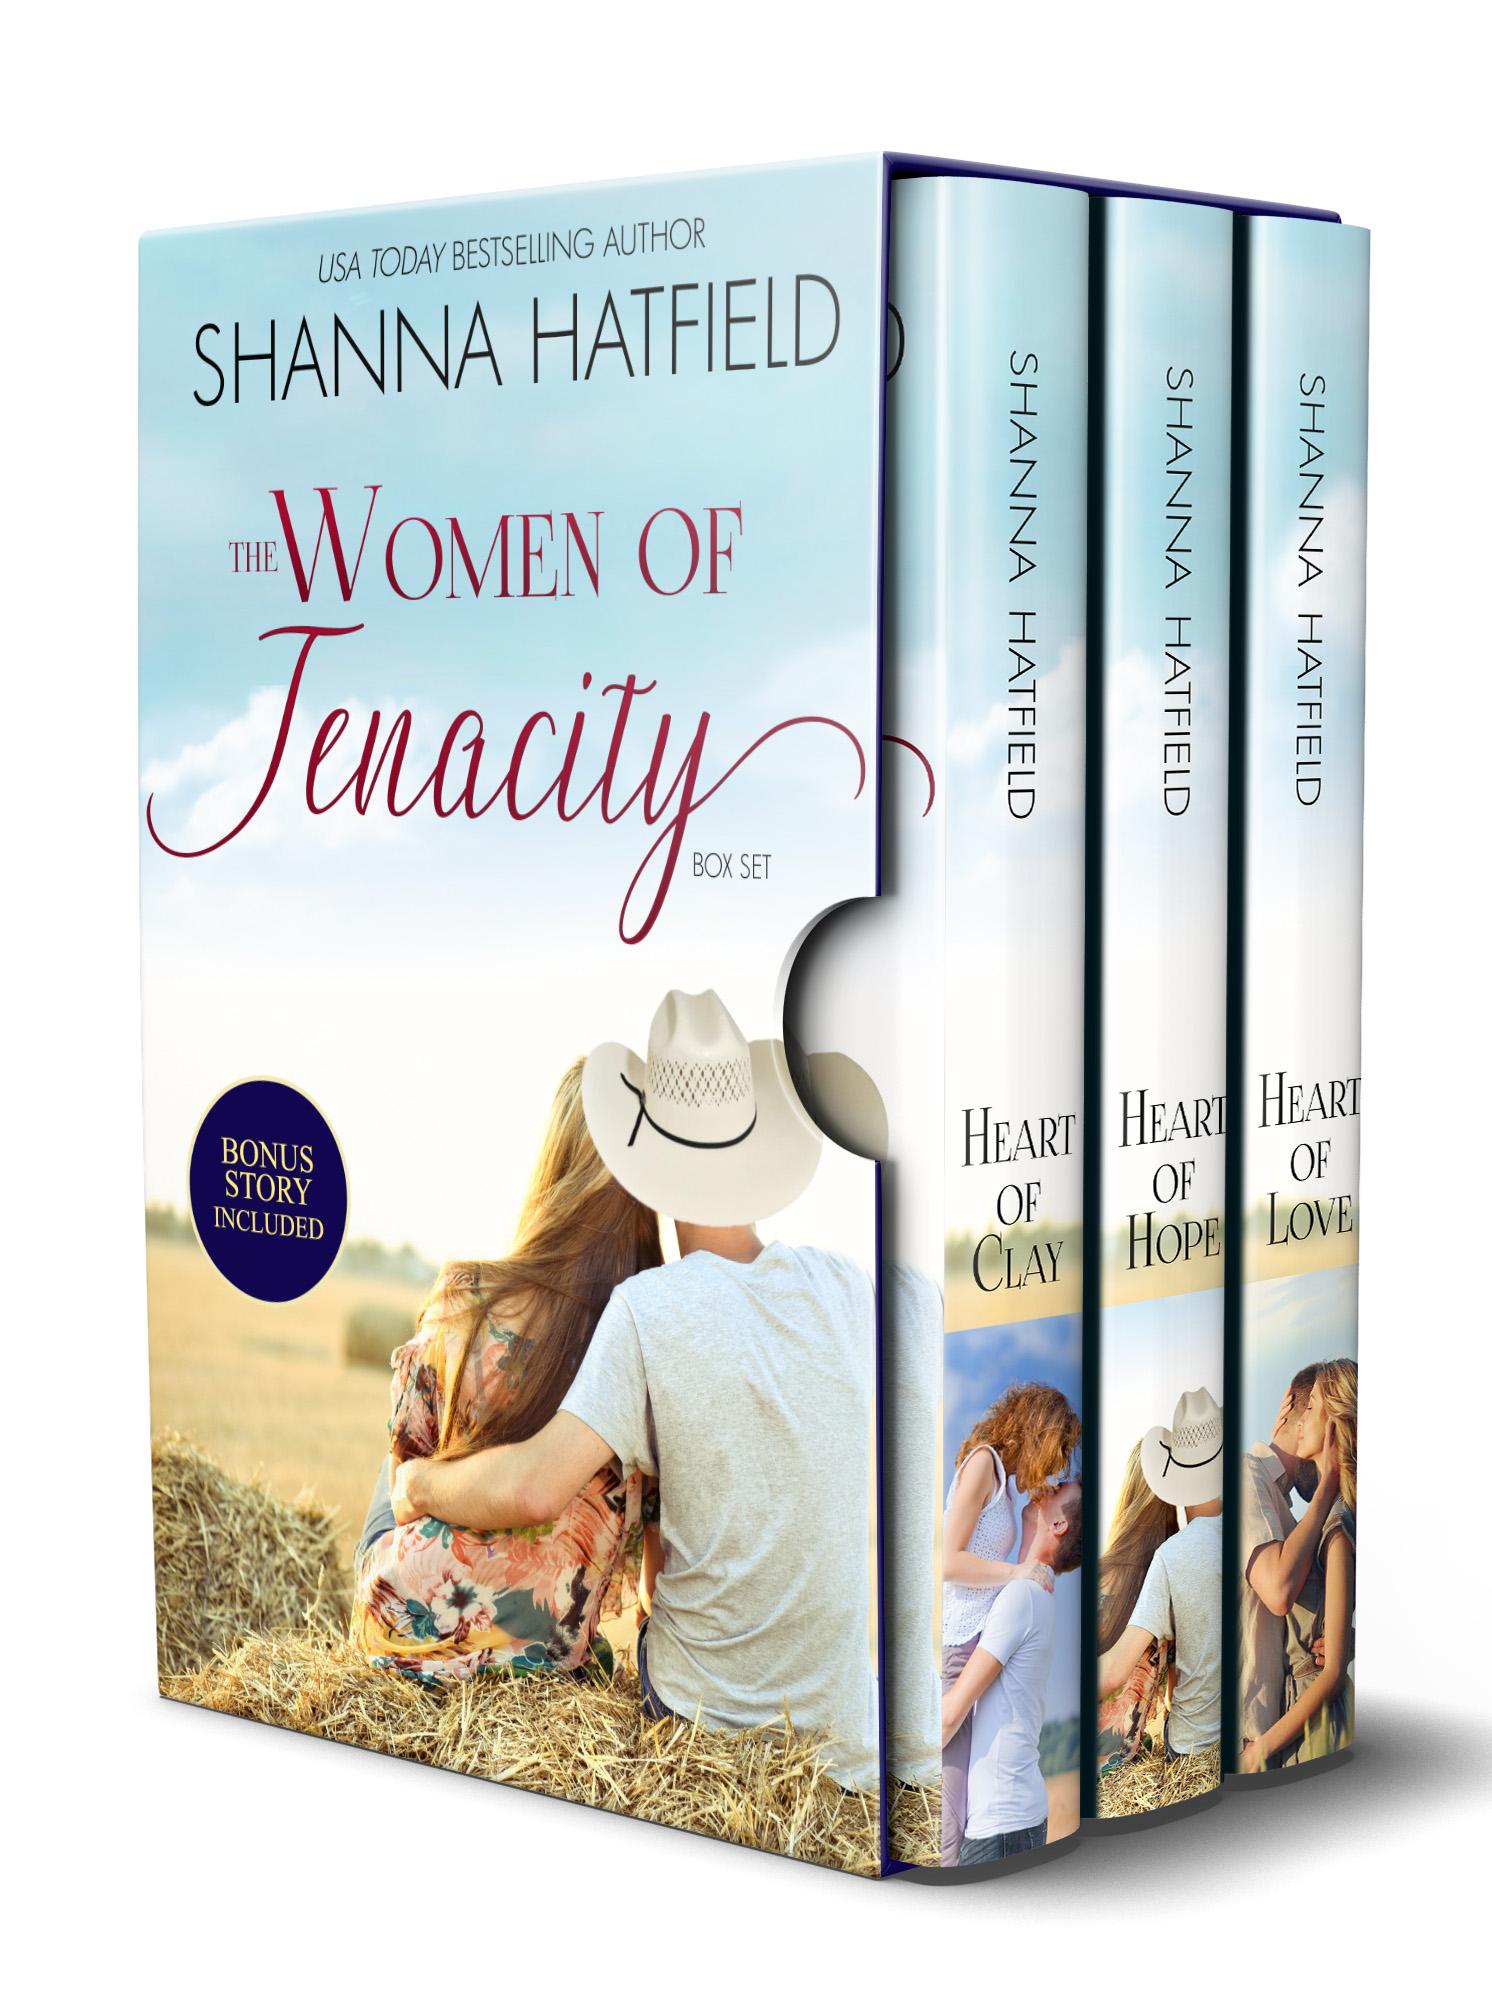 Women of Tenacity Boxed Set